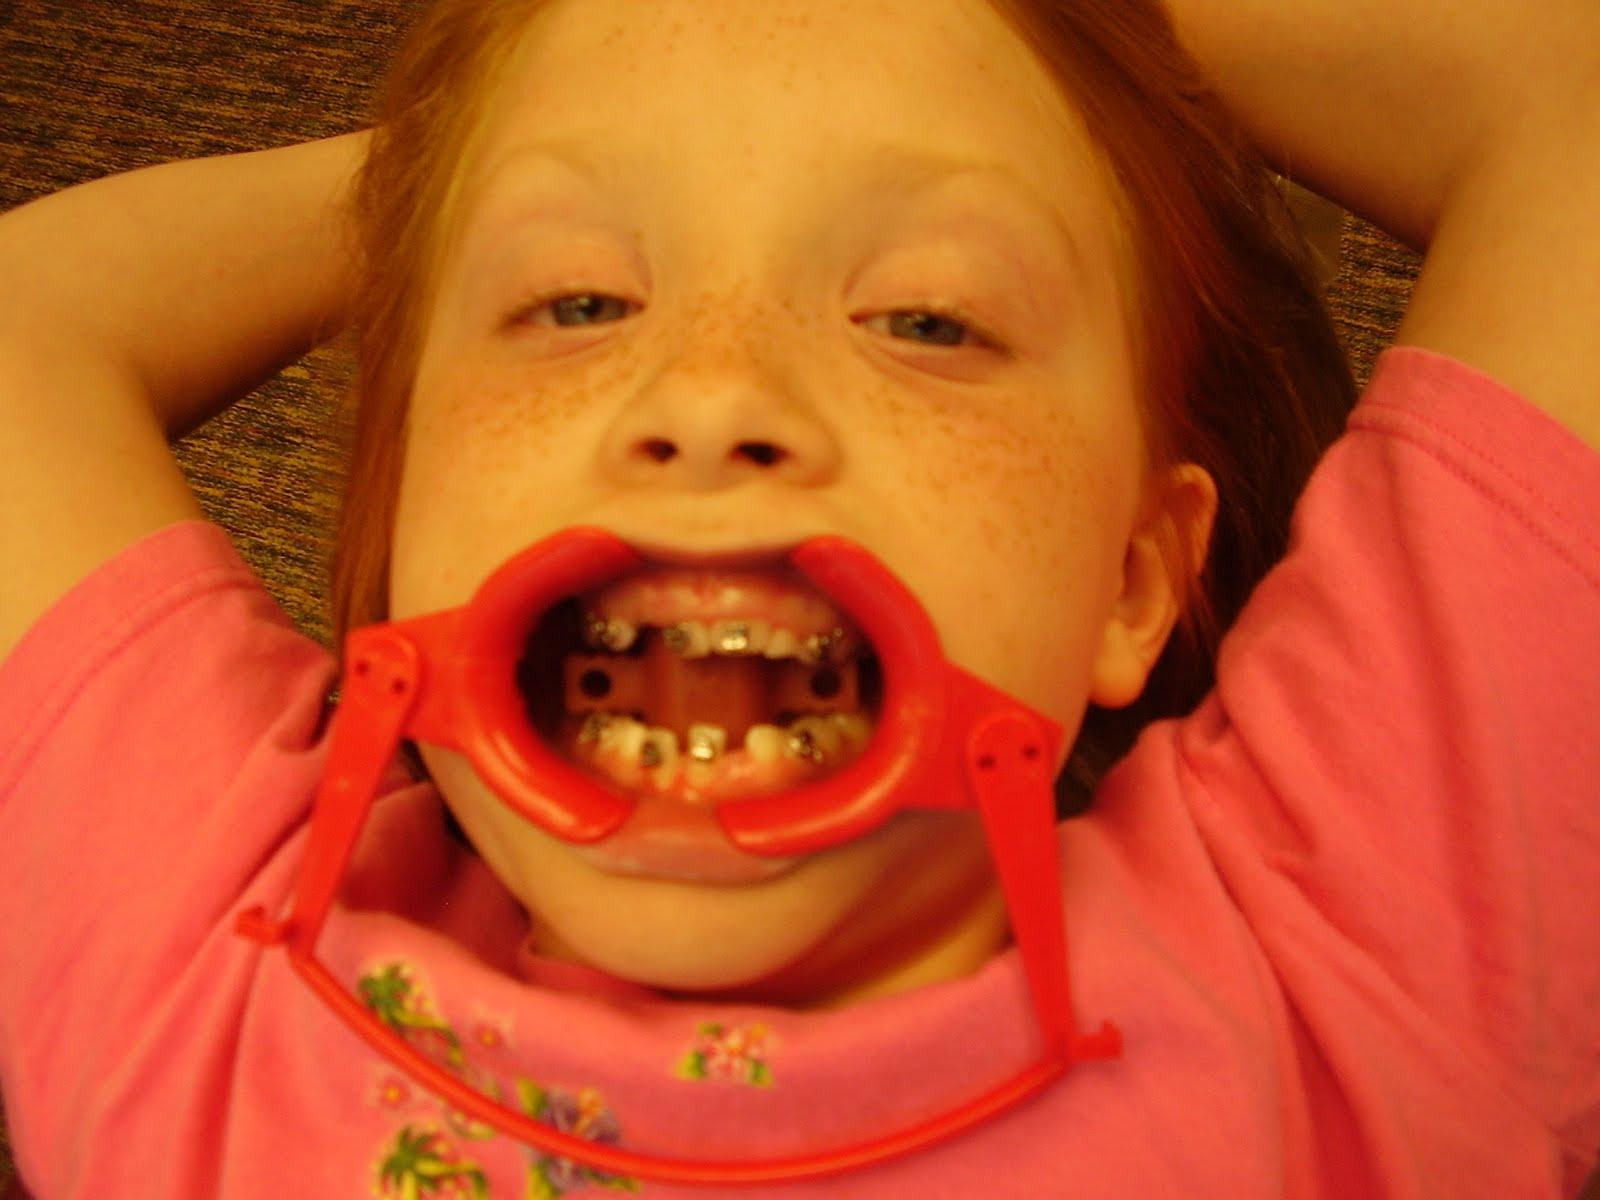 P.S. from Ar... Peyton Orthodontics